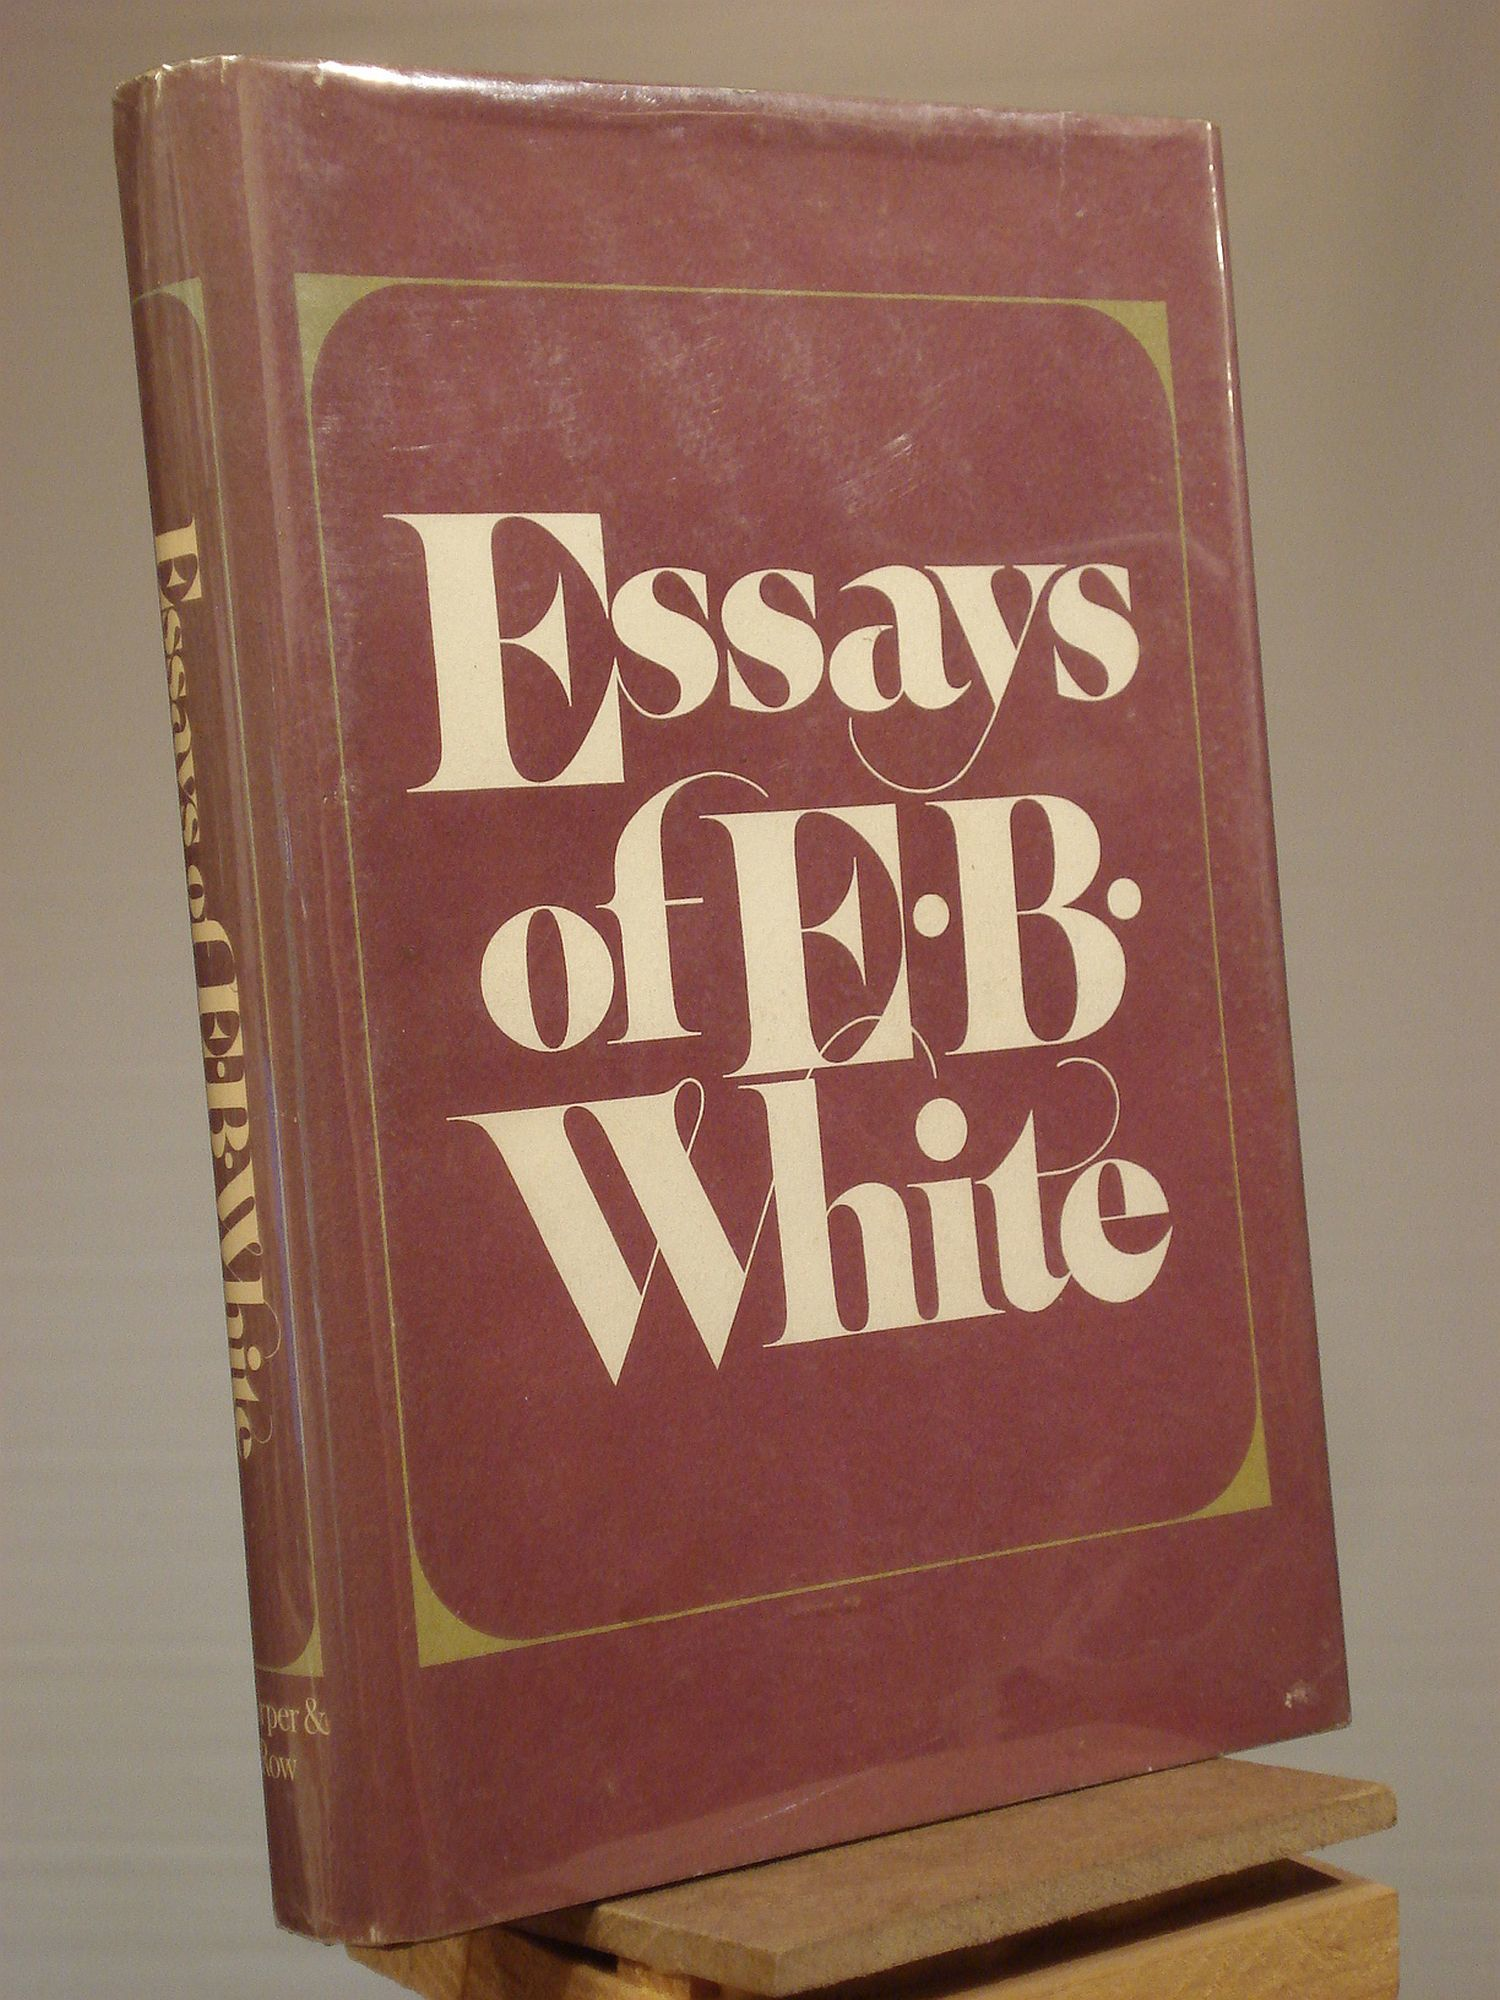 007 X White Essays Essay Unusual Eb Summary Online Pdf Full